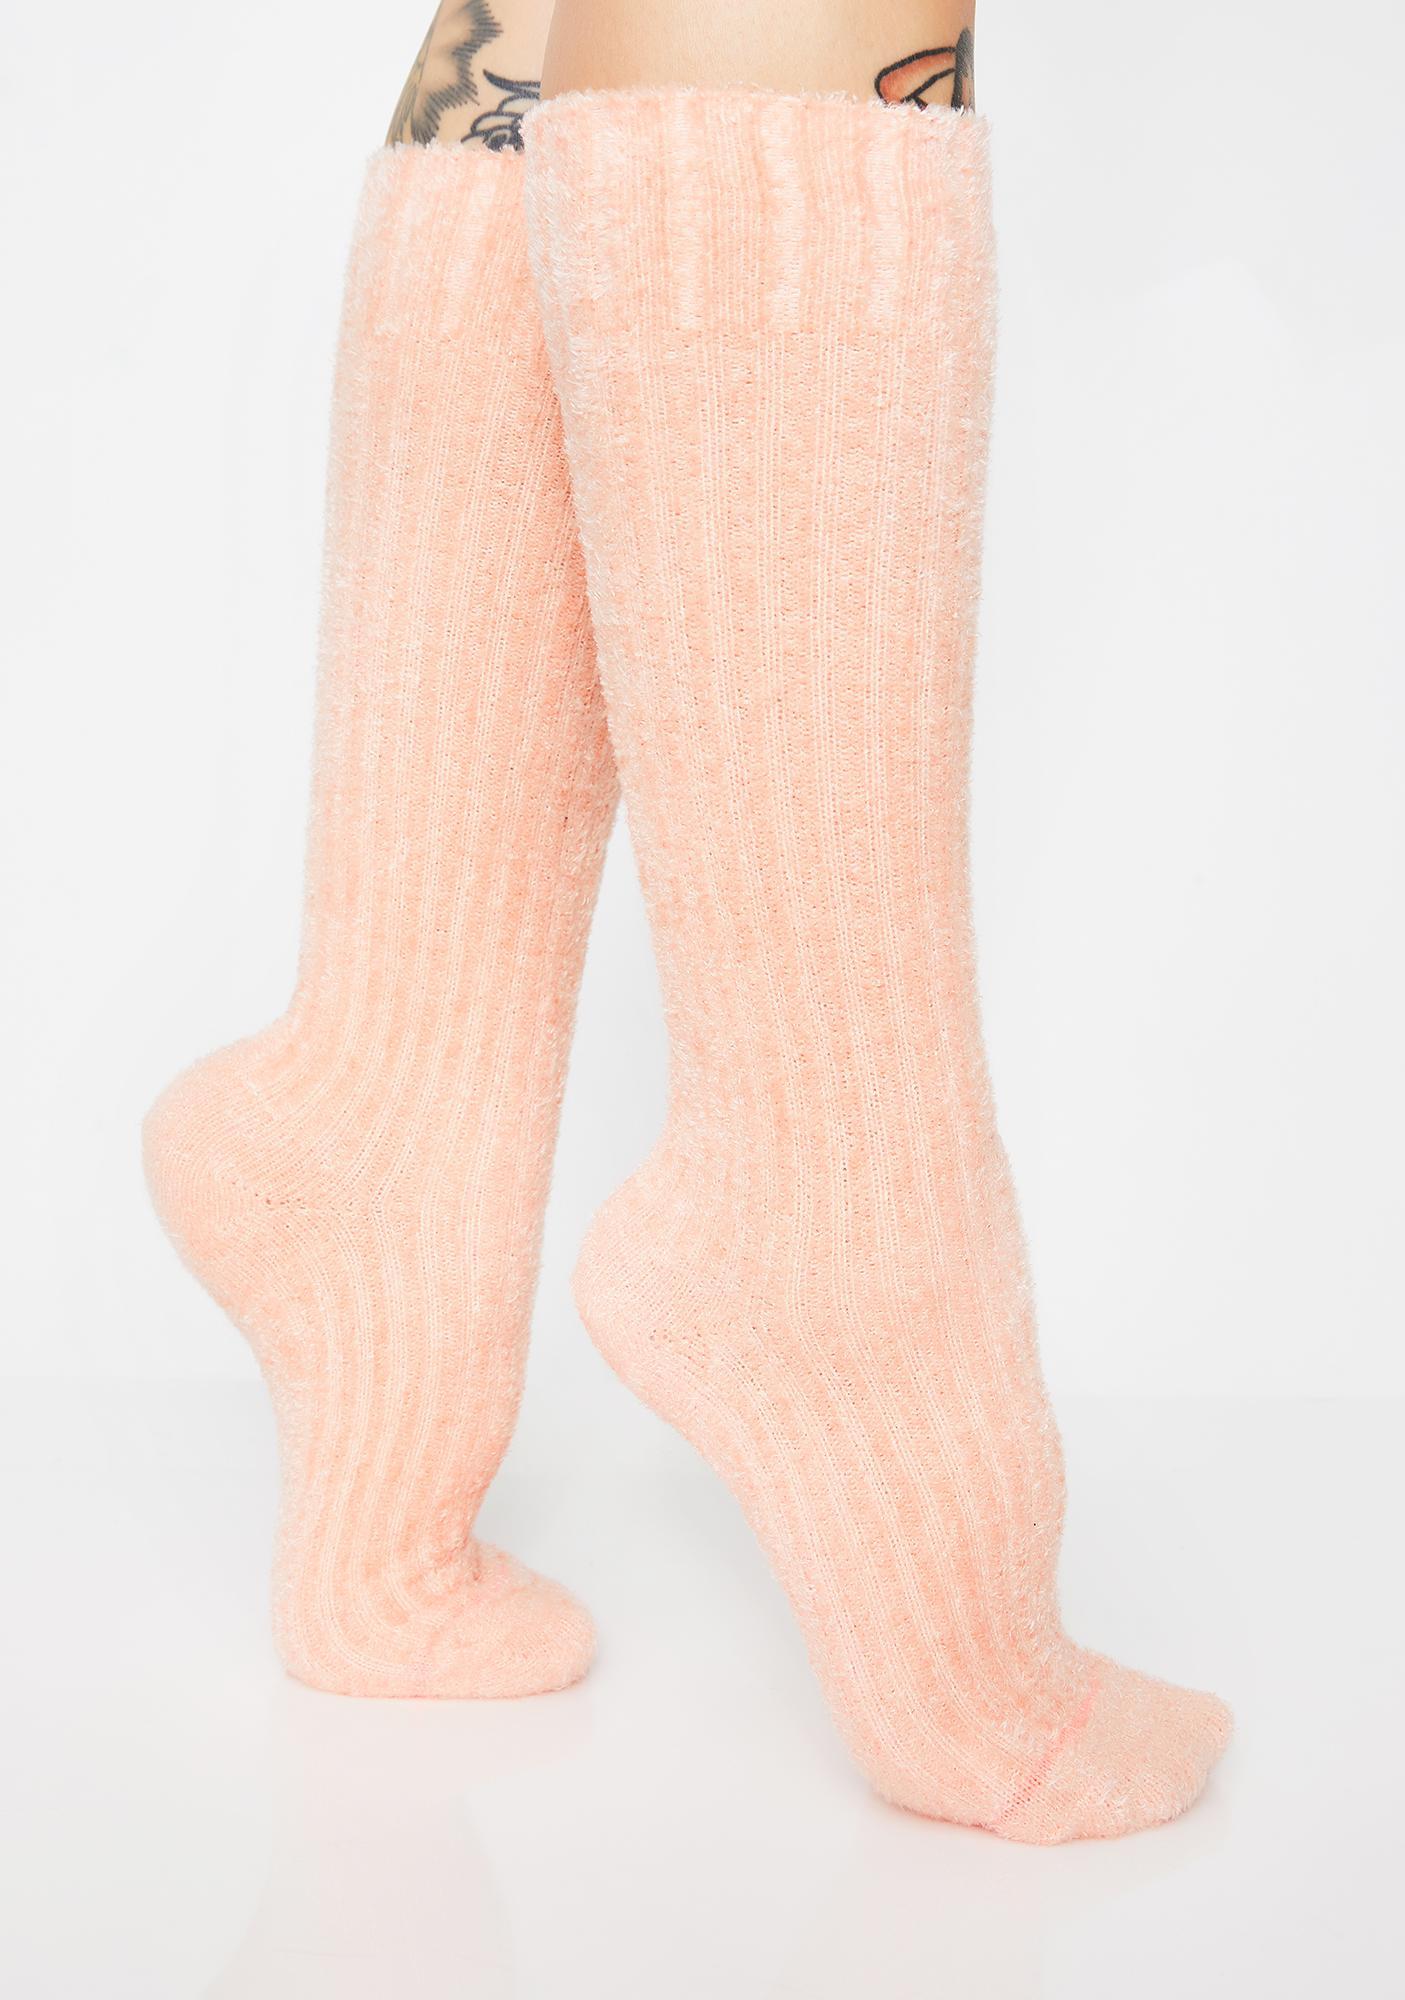 Stance Peachy Keen Socks